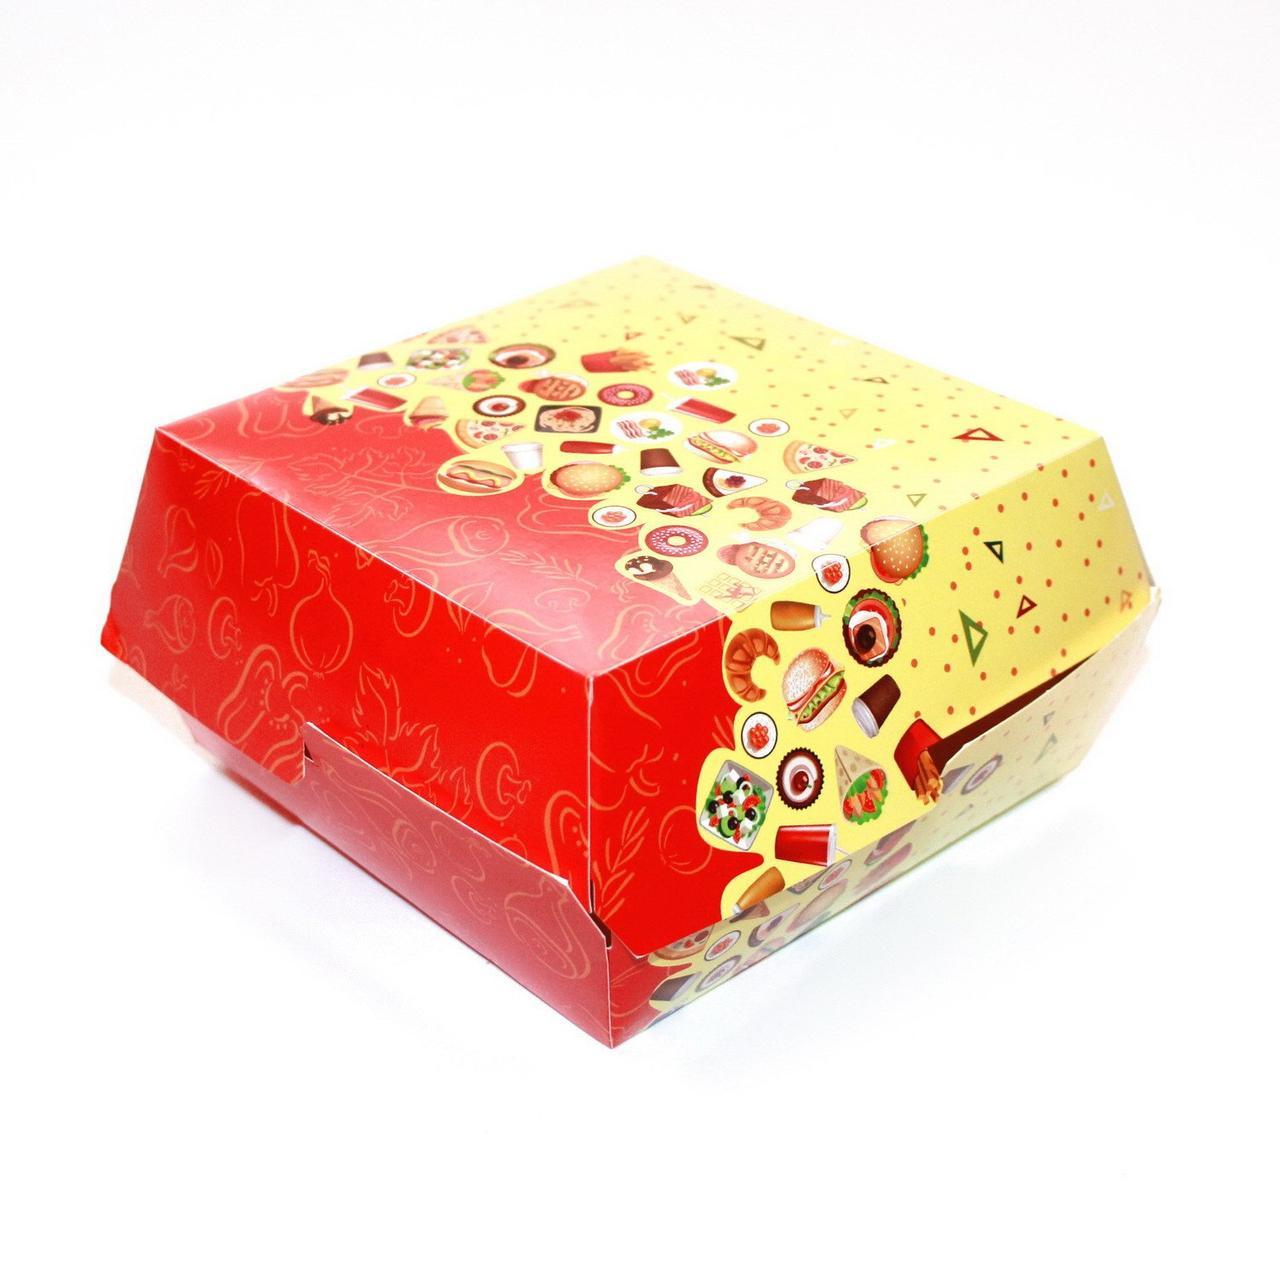 Коробка д/бургера 120х120х70мм с печатью Рог изобилия, 300 шт